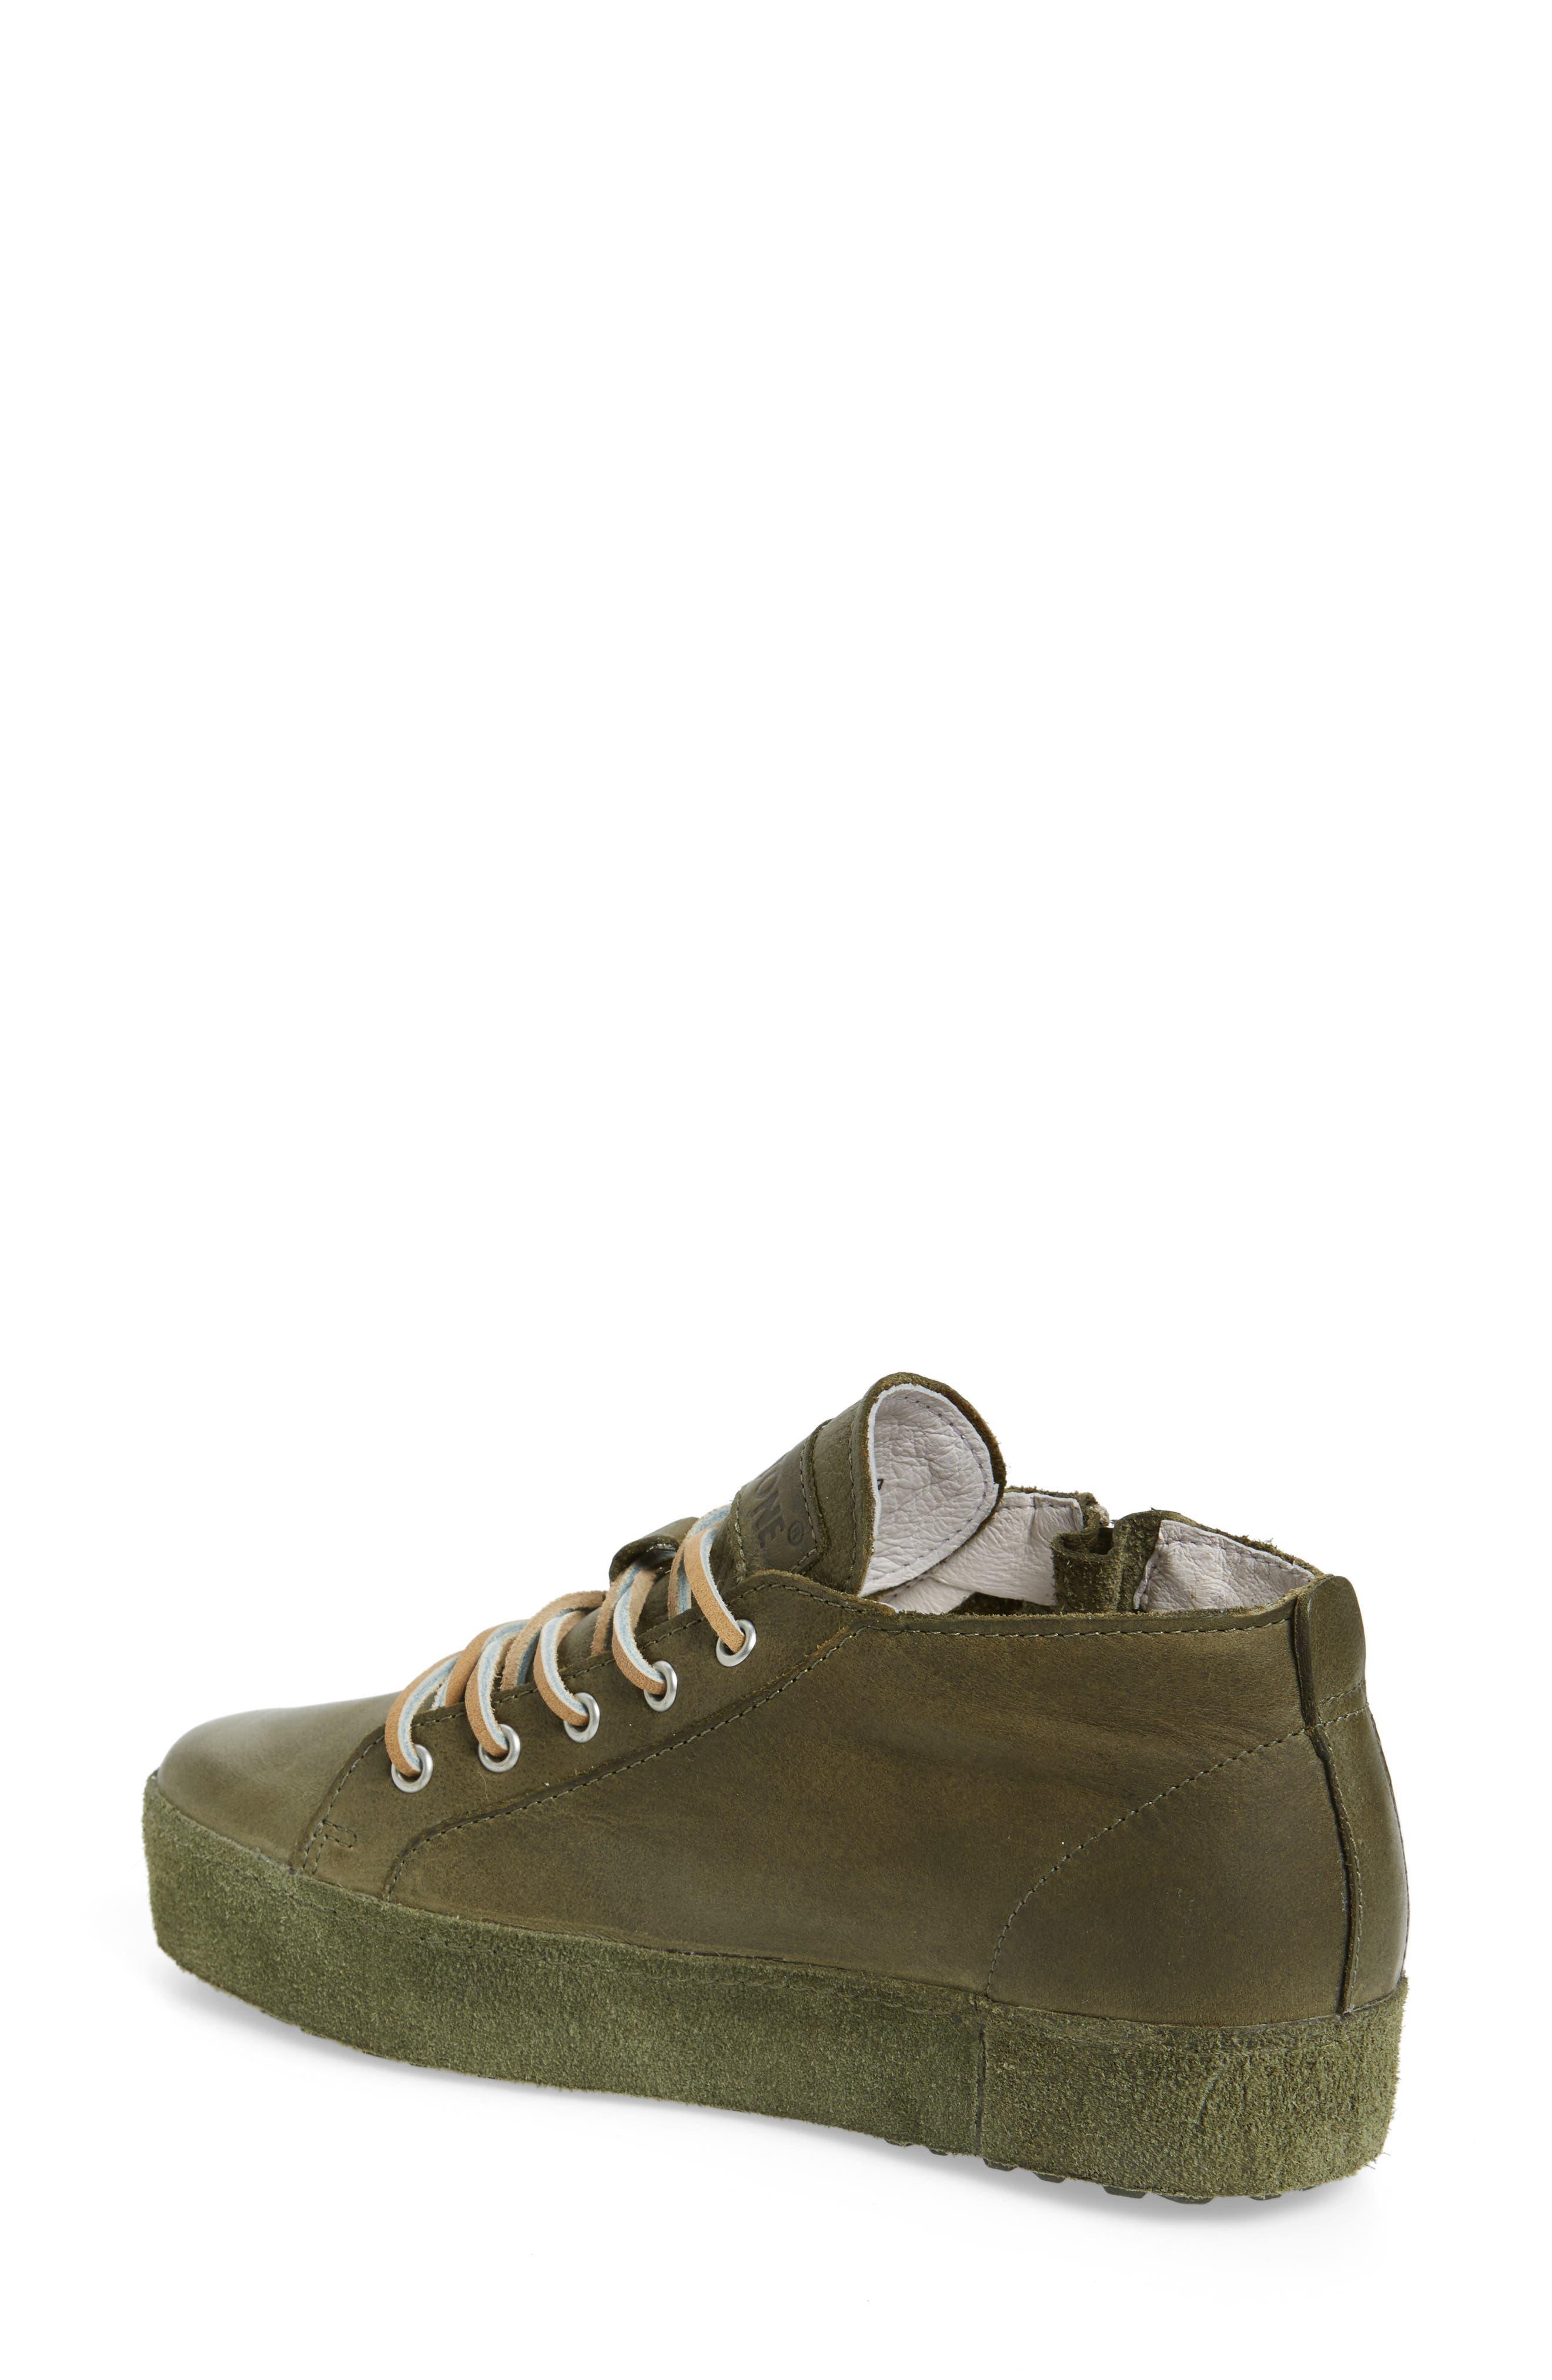 NL37 Midi Platform Sneaker,                             Alternate thumbnail 2, color,                             OLIVE LEATHER